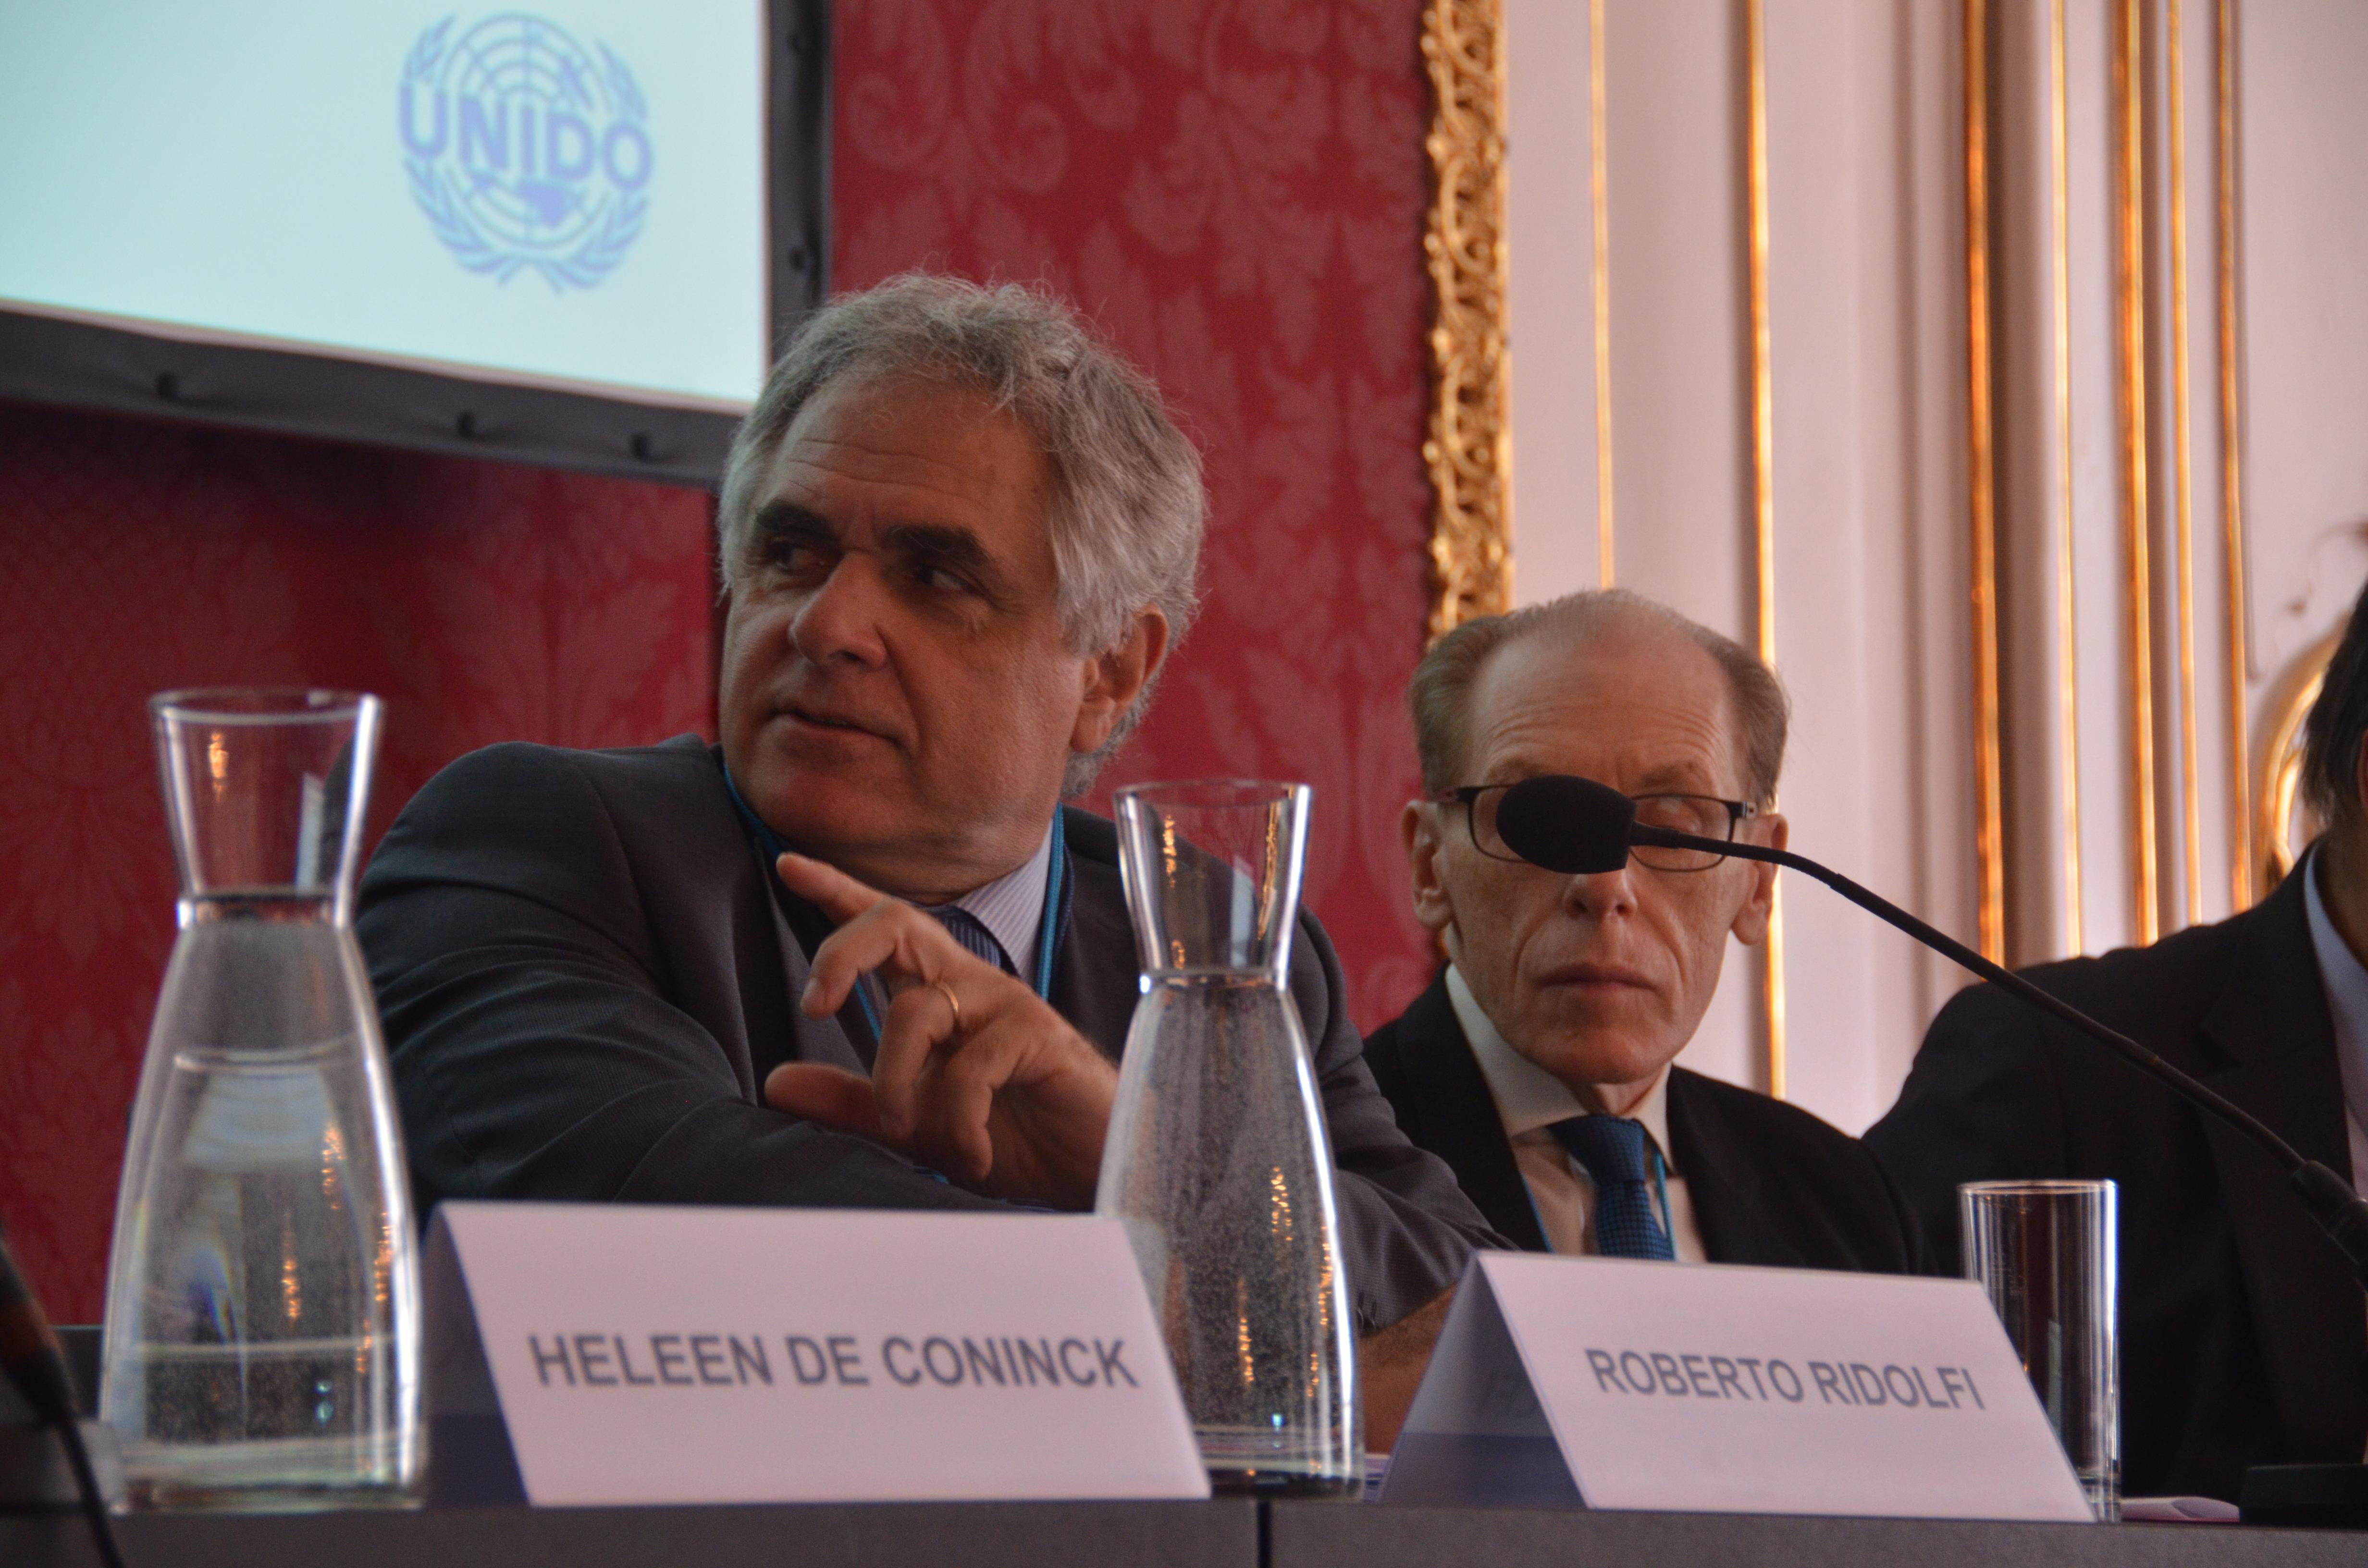 Vienna_Energy_Forum_2015 172.JPG